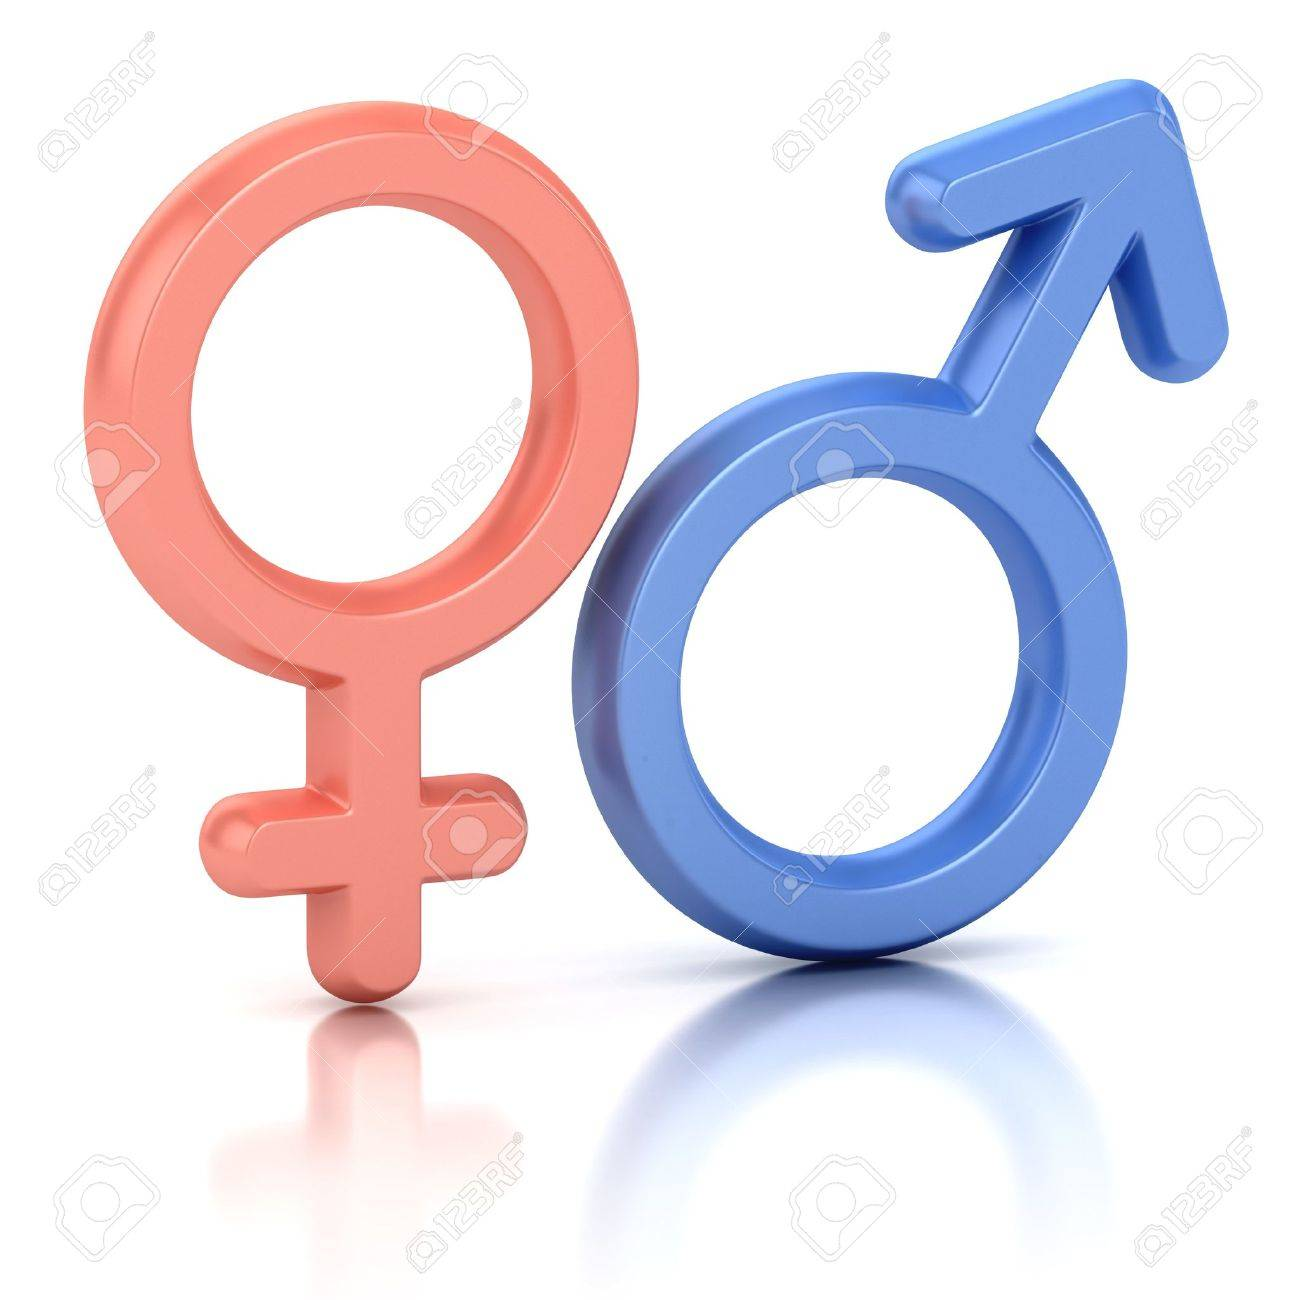 Symbols for sex